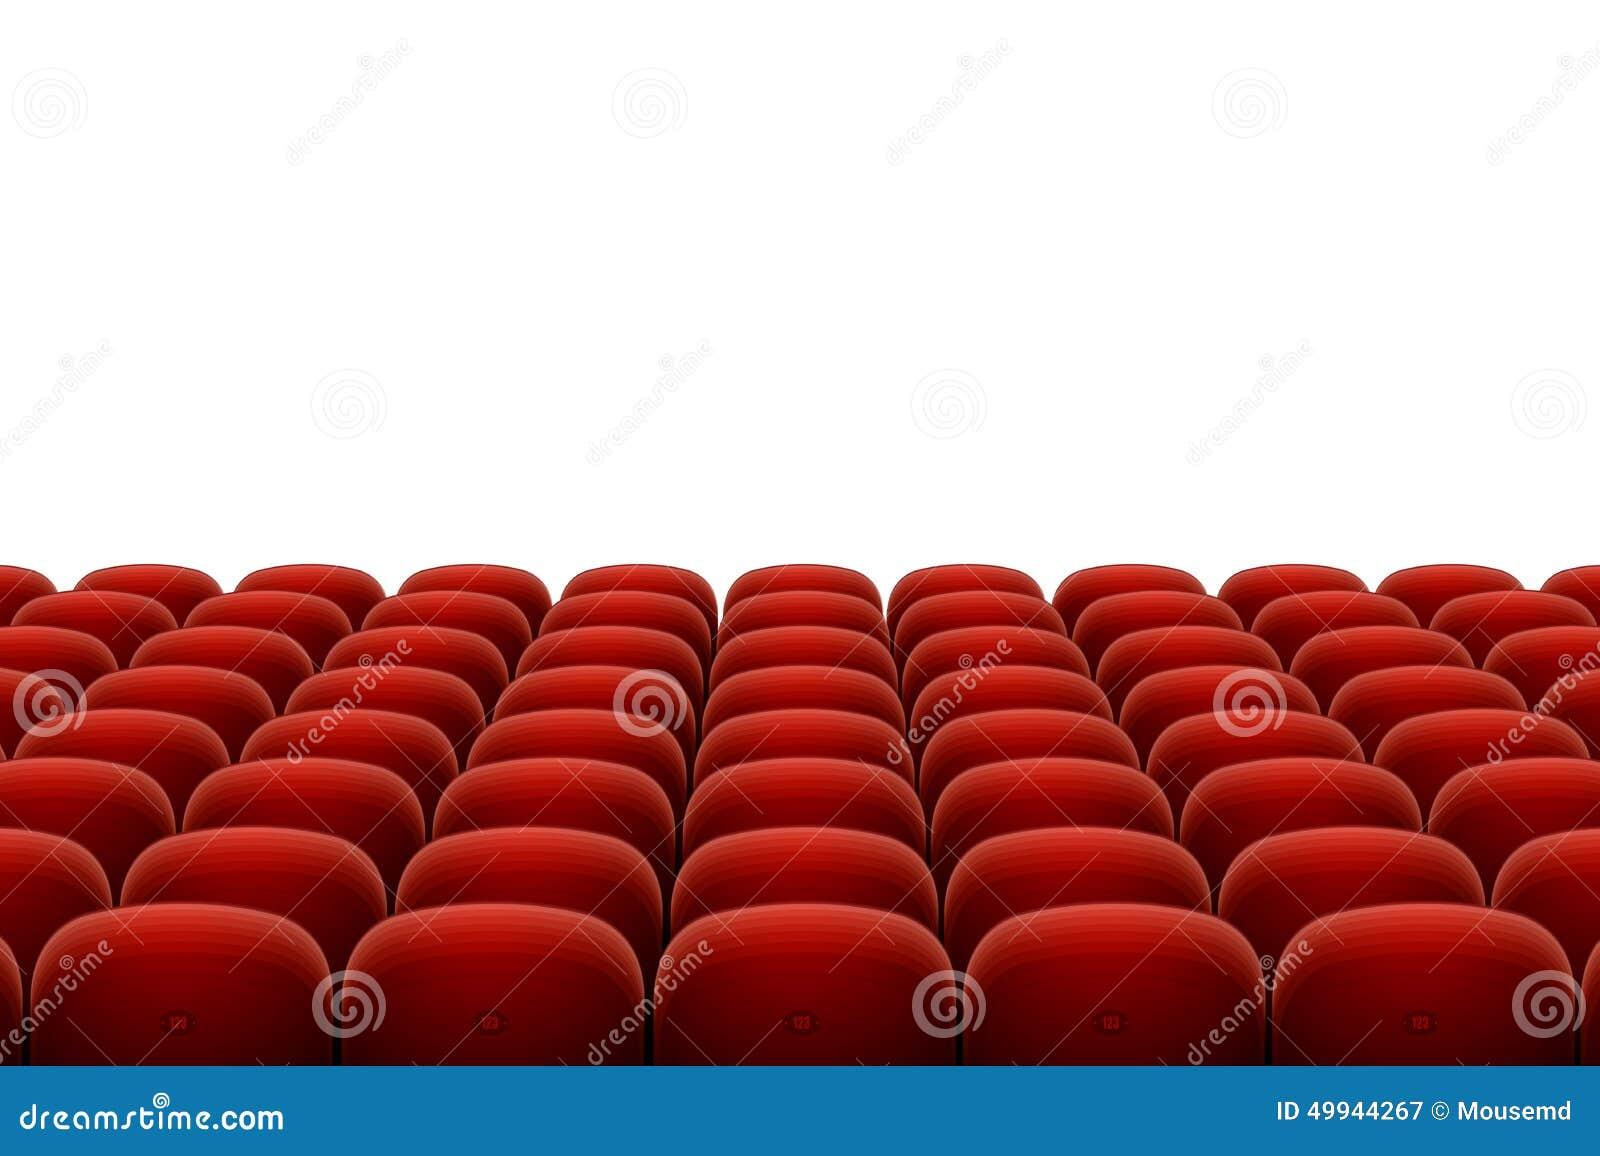 Vector Red Cinema Theatre Seats Stock Vector